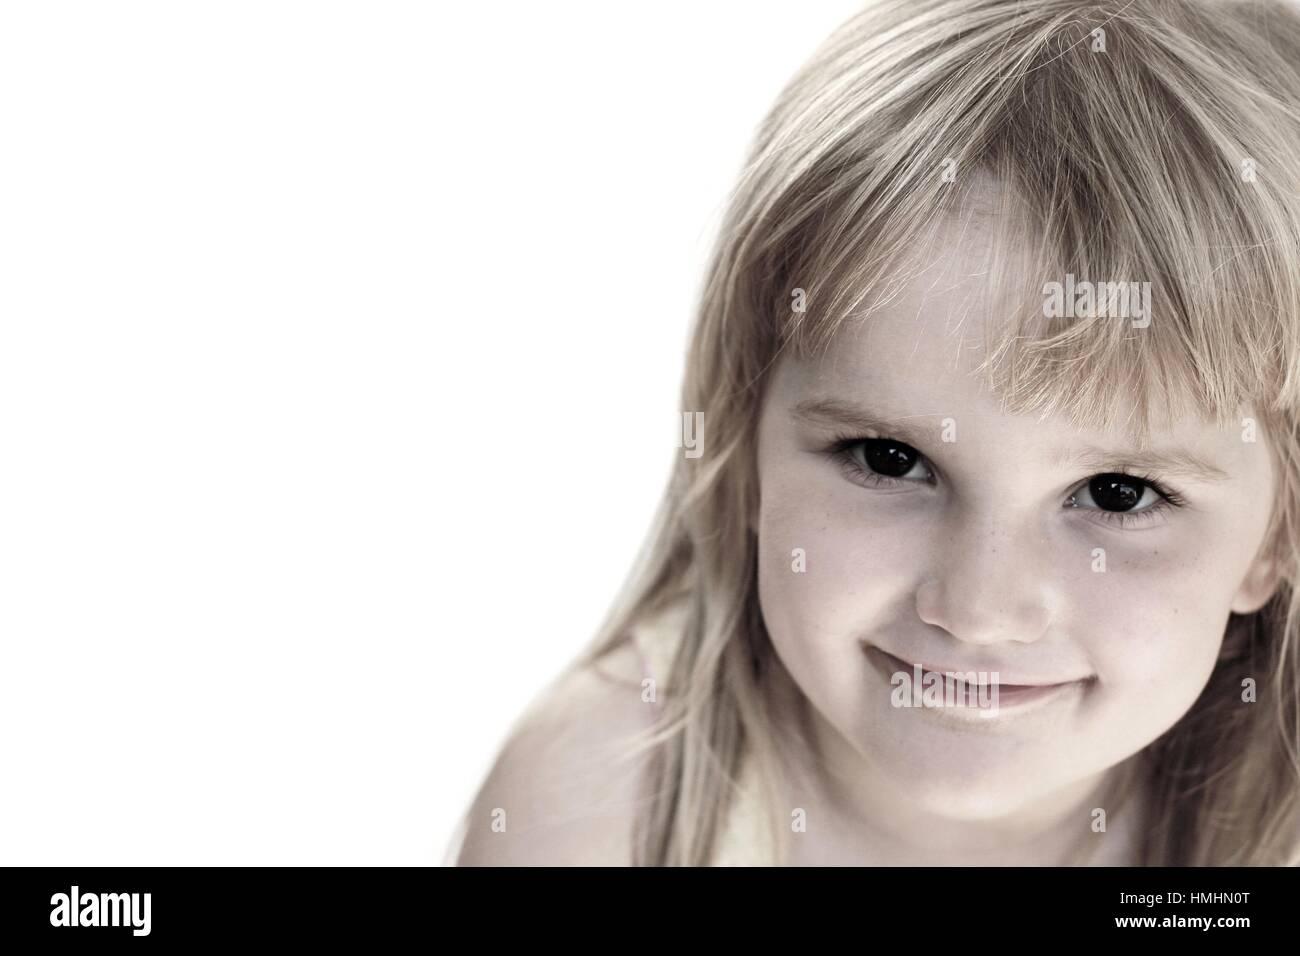 Sweet Blonde Little Girl With A Gentle Sweet Smile Portrait Brown Eyes Blonde Hair